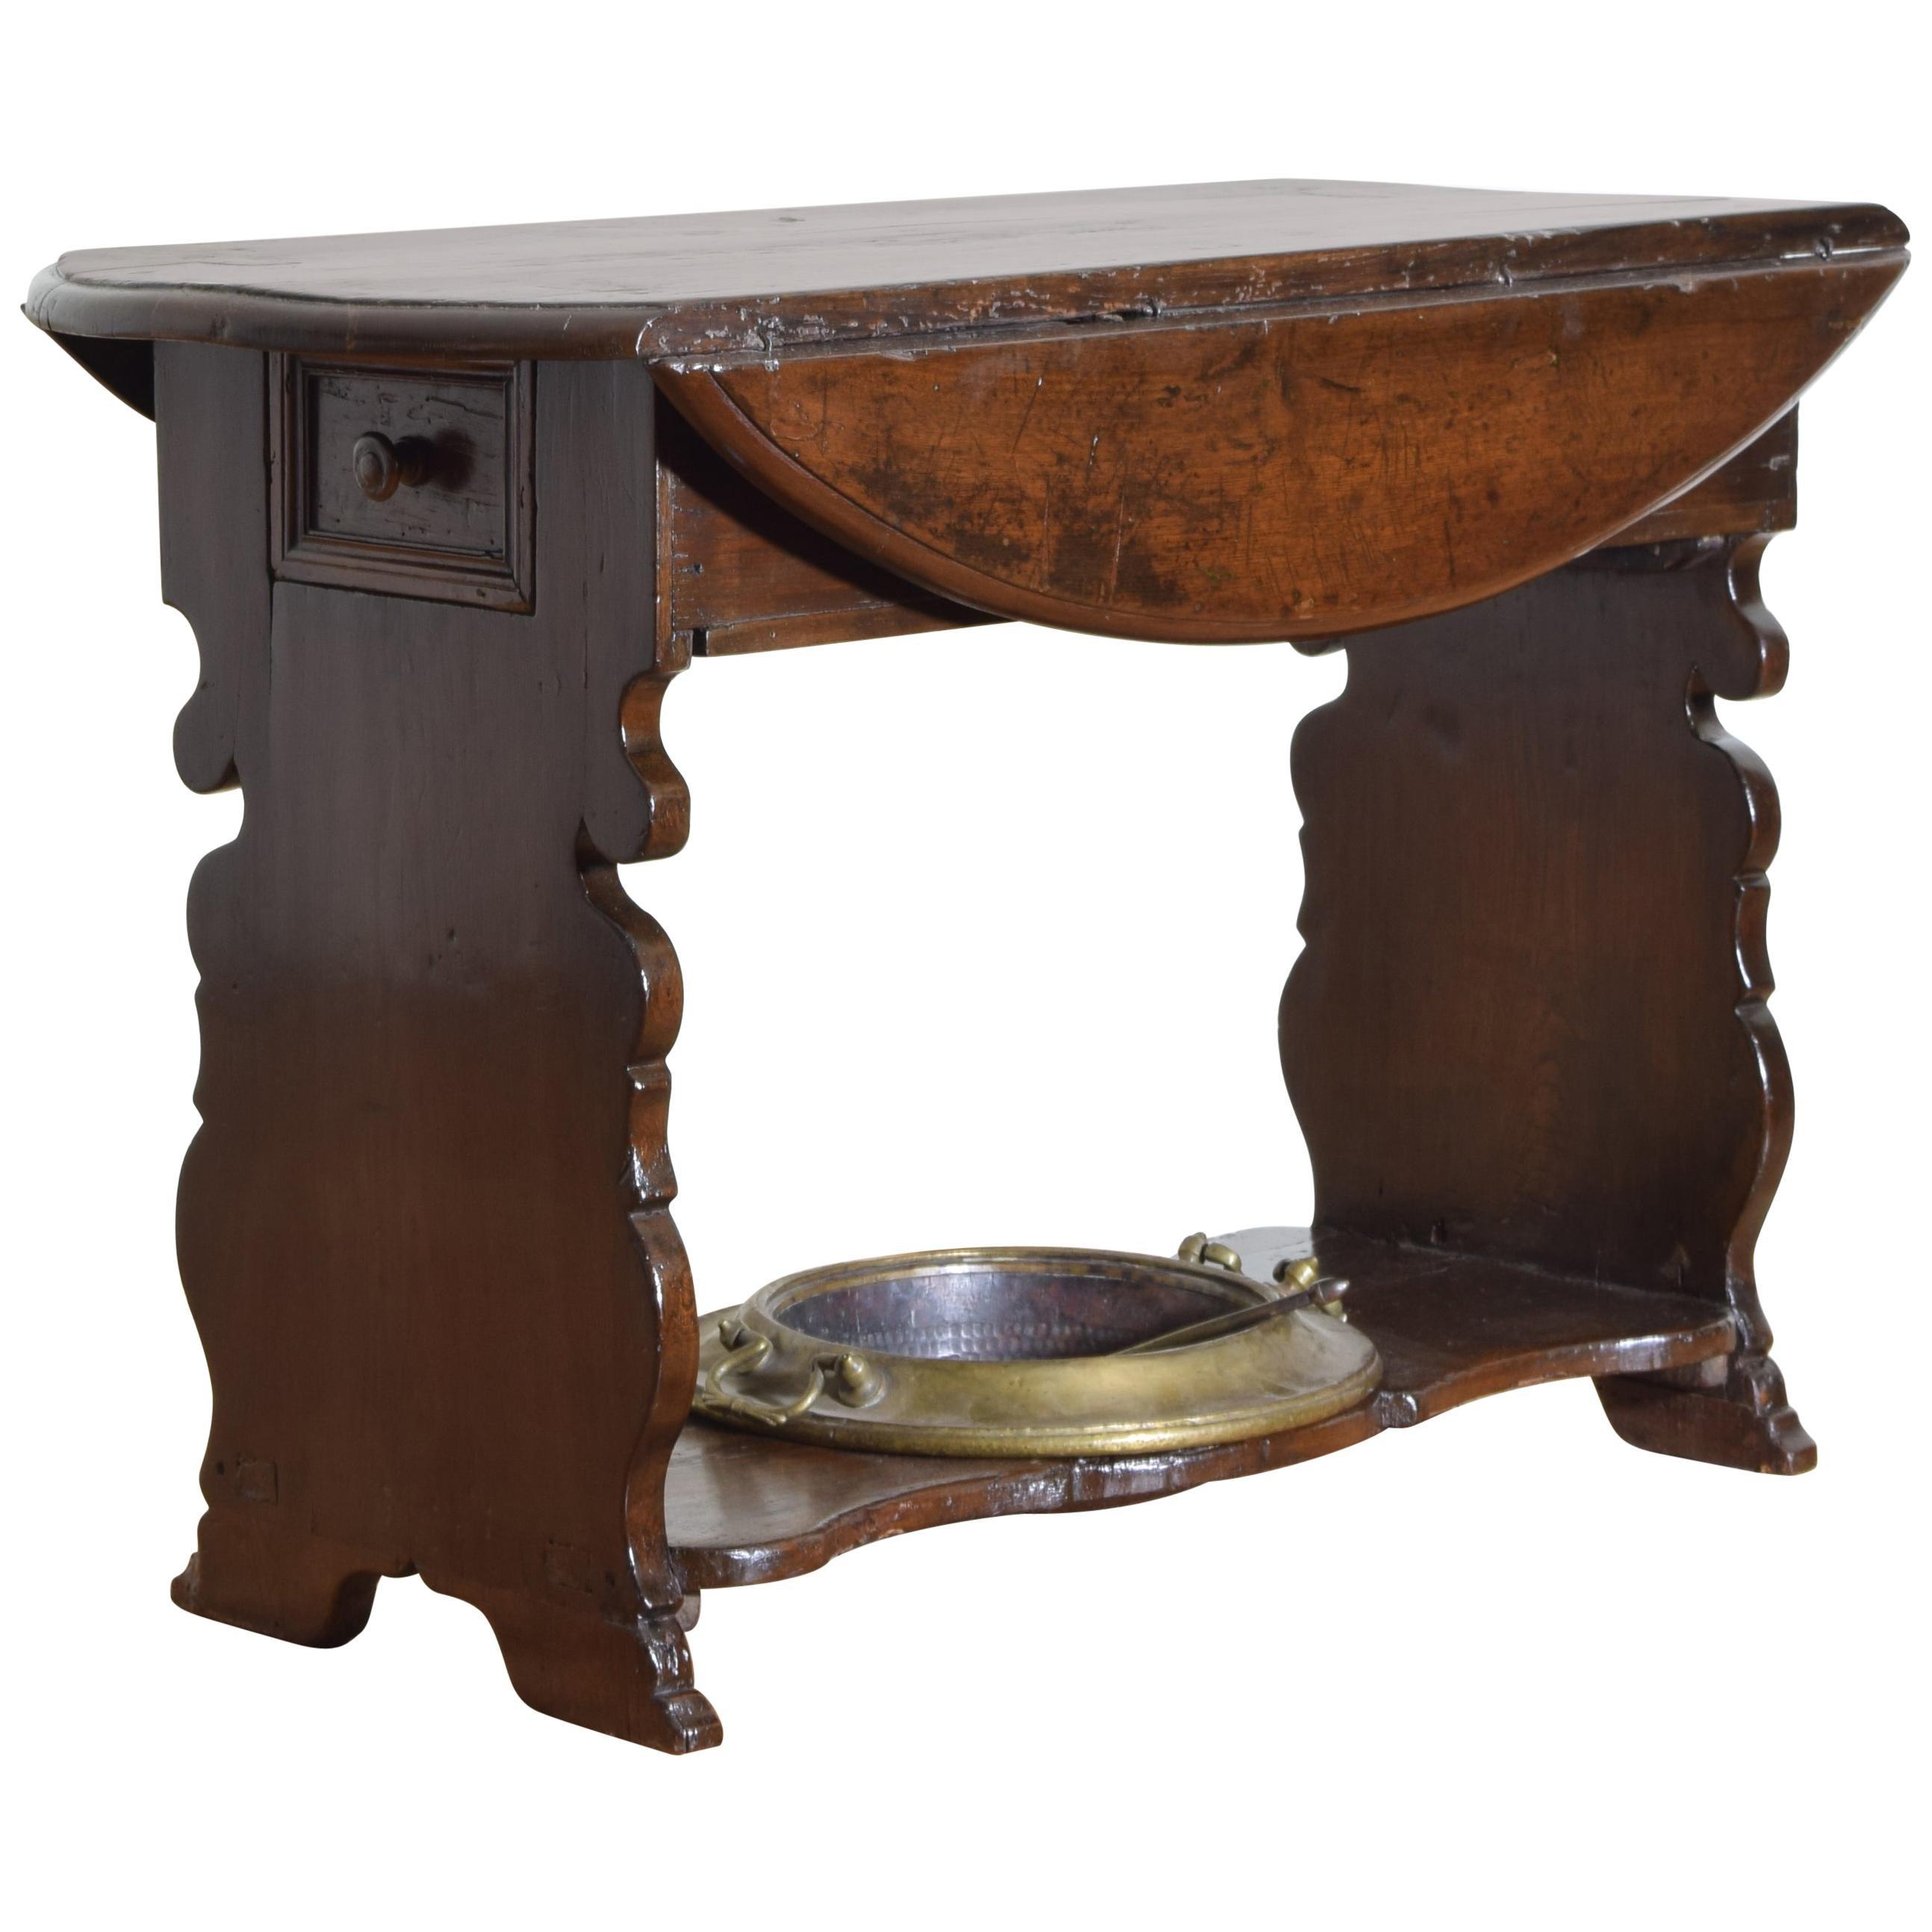 Italian Baroque Dropleaf Bracciere Table in Poplar, late 17th-early 18th Century